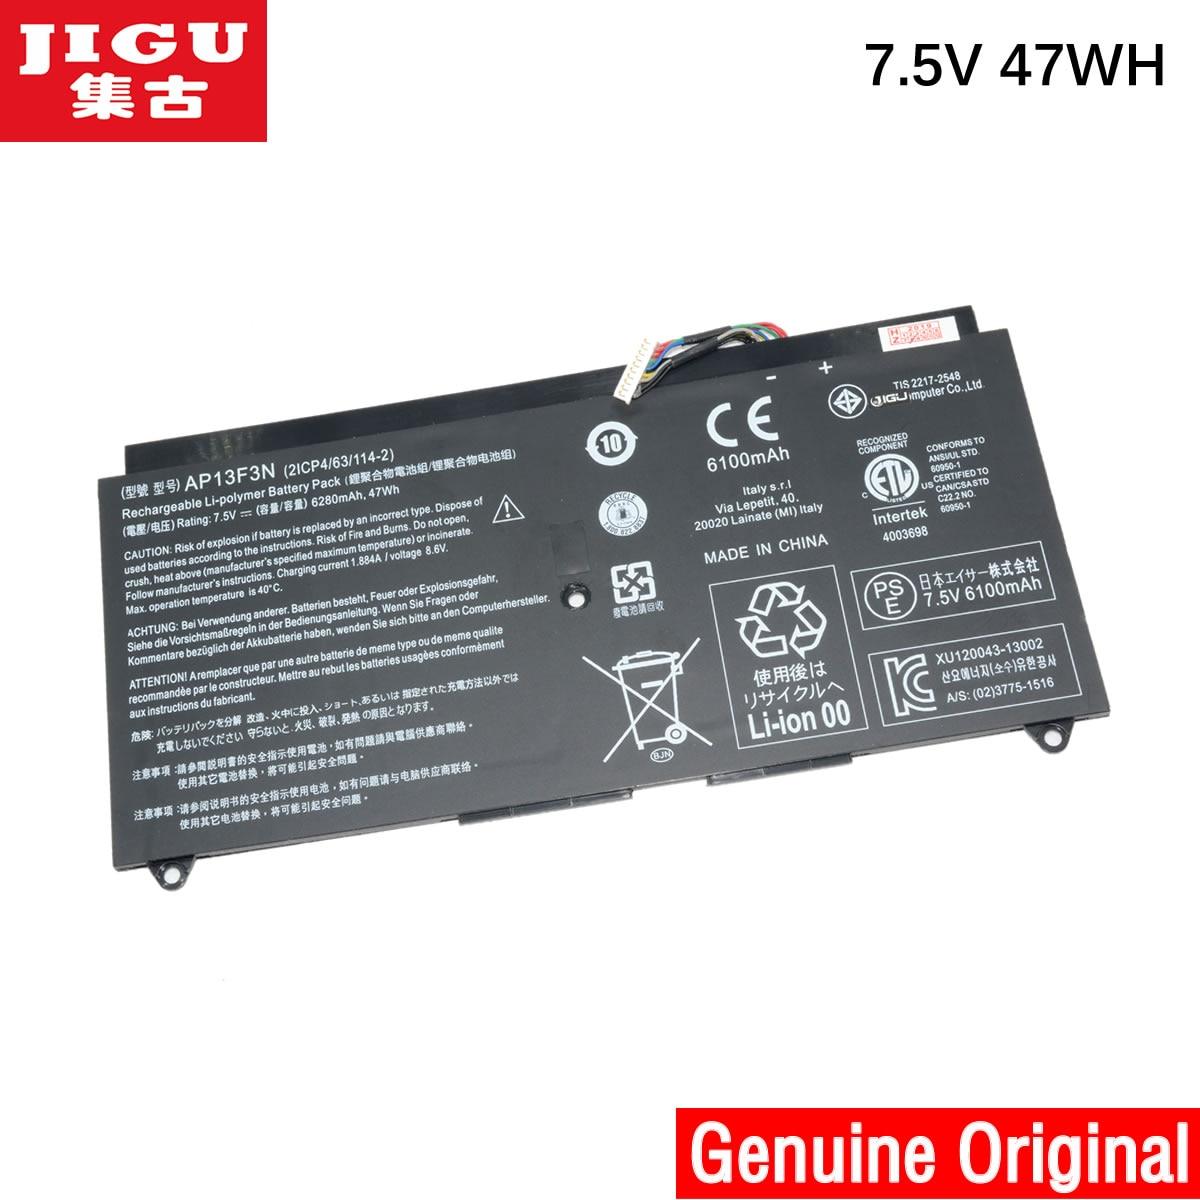 JIGU-batería Original para ordenador portátil, pila de 7,5 V, 47WH, 21CP4/63/114-2, AP13F3N,...